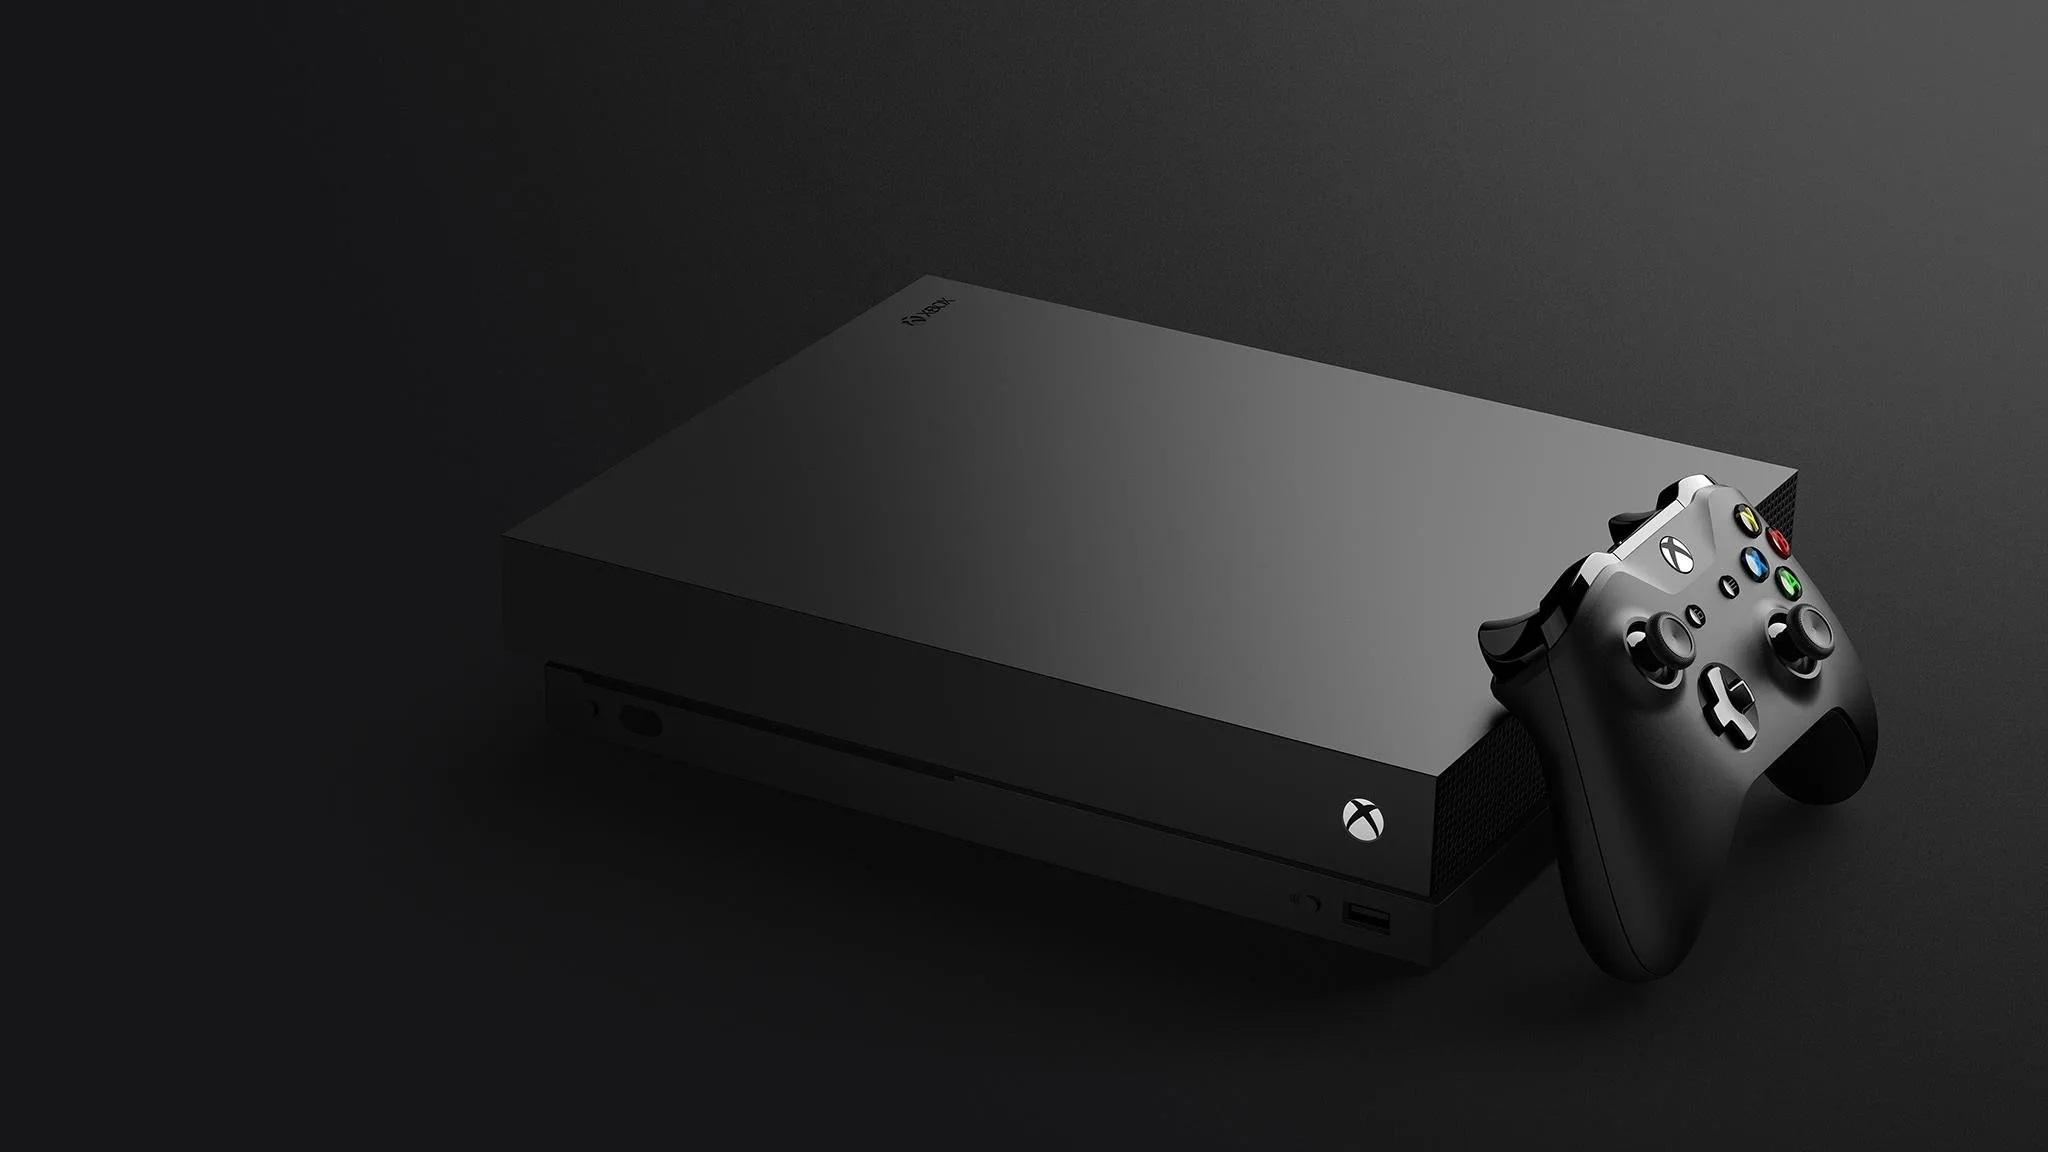 В ожидании Xbox Series X: Microsoft прекращает производство Xbox One X и Xbox One S All-Digital Edition